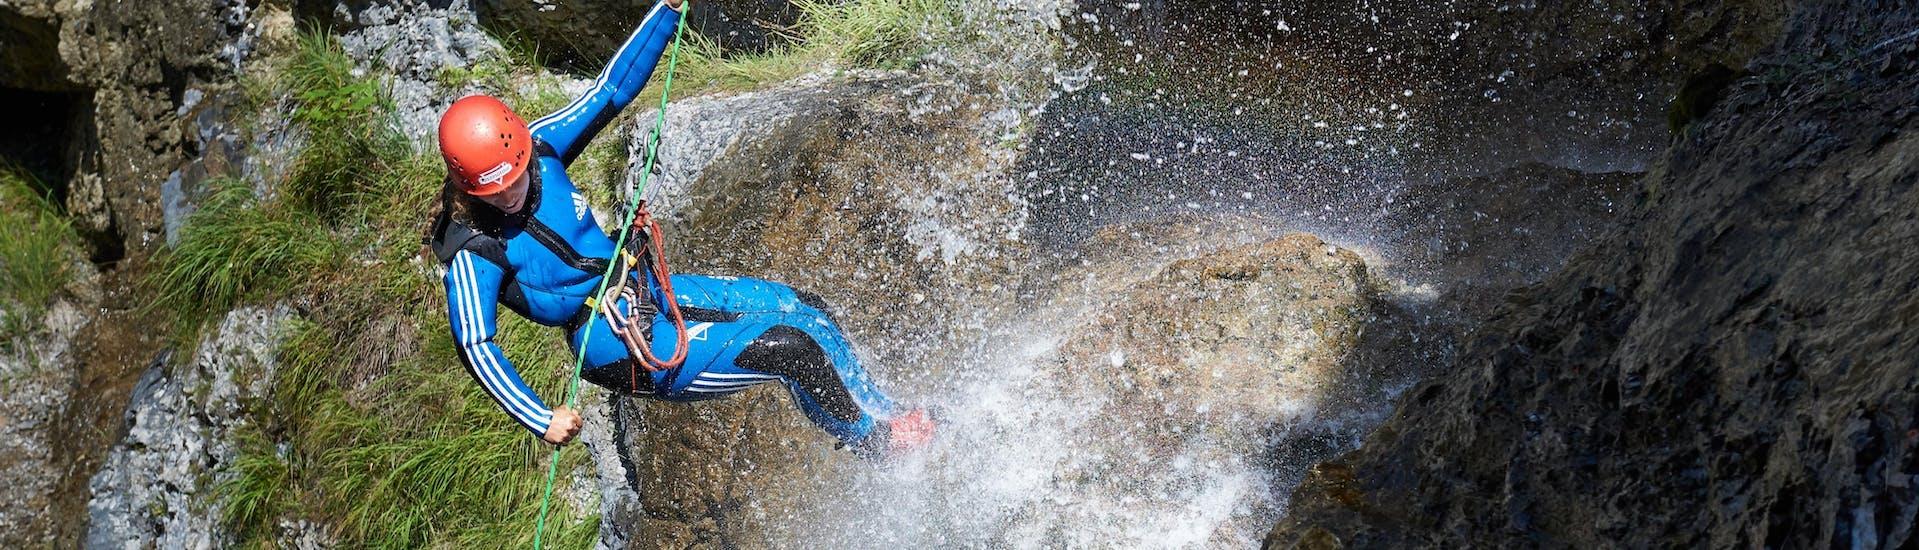 canyoning-jurassic-large-for-explorer---auerklamm-faszinatour-hero